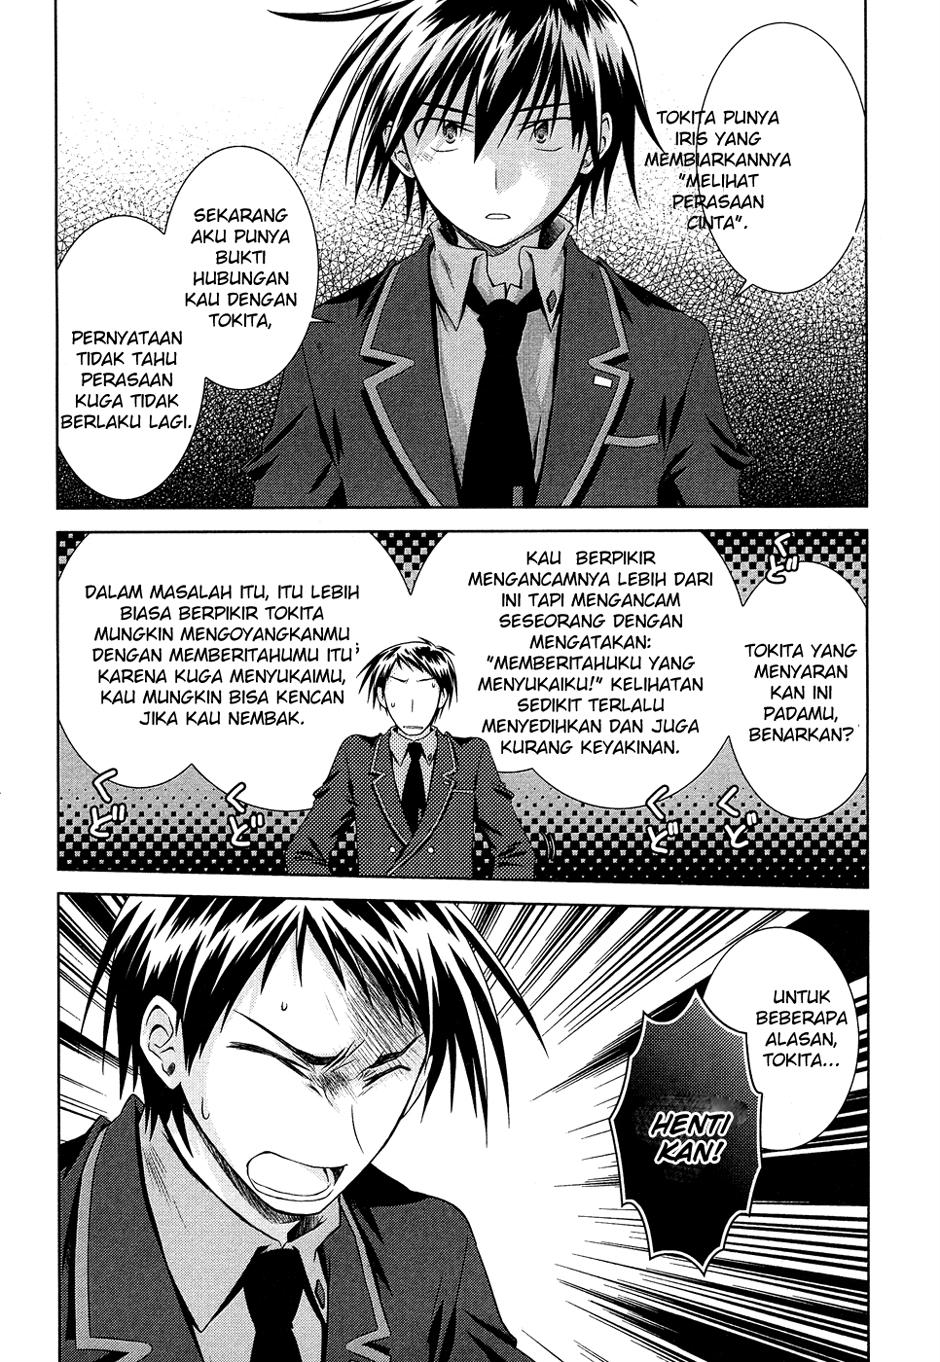 Komik iris zero 011 12 Indonesia iris zero 011 Terbaru 27|Baca Manga Komik Indonesia|